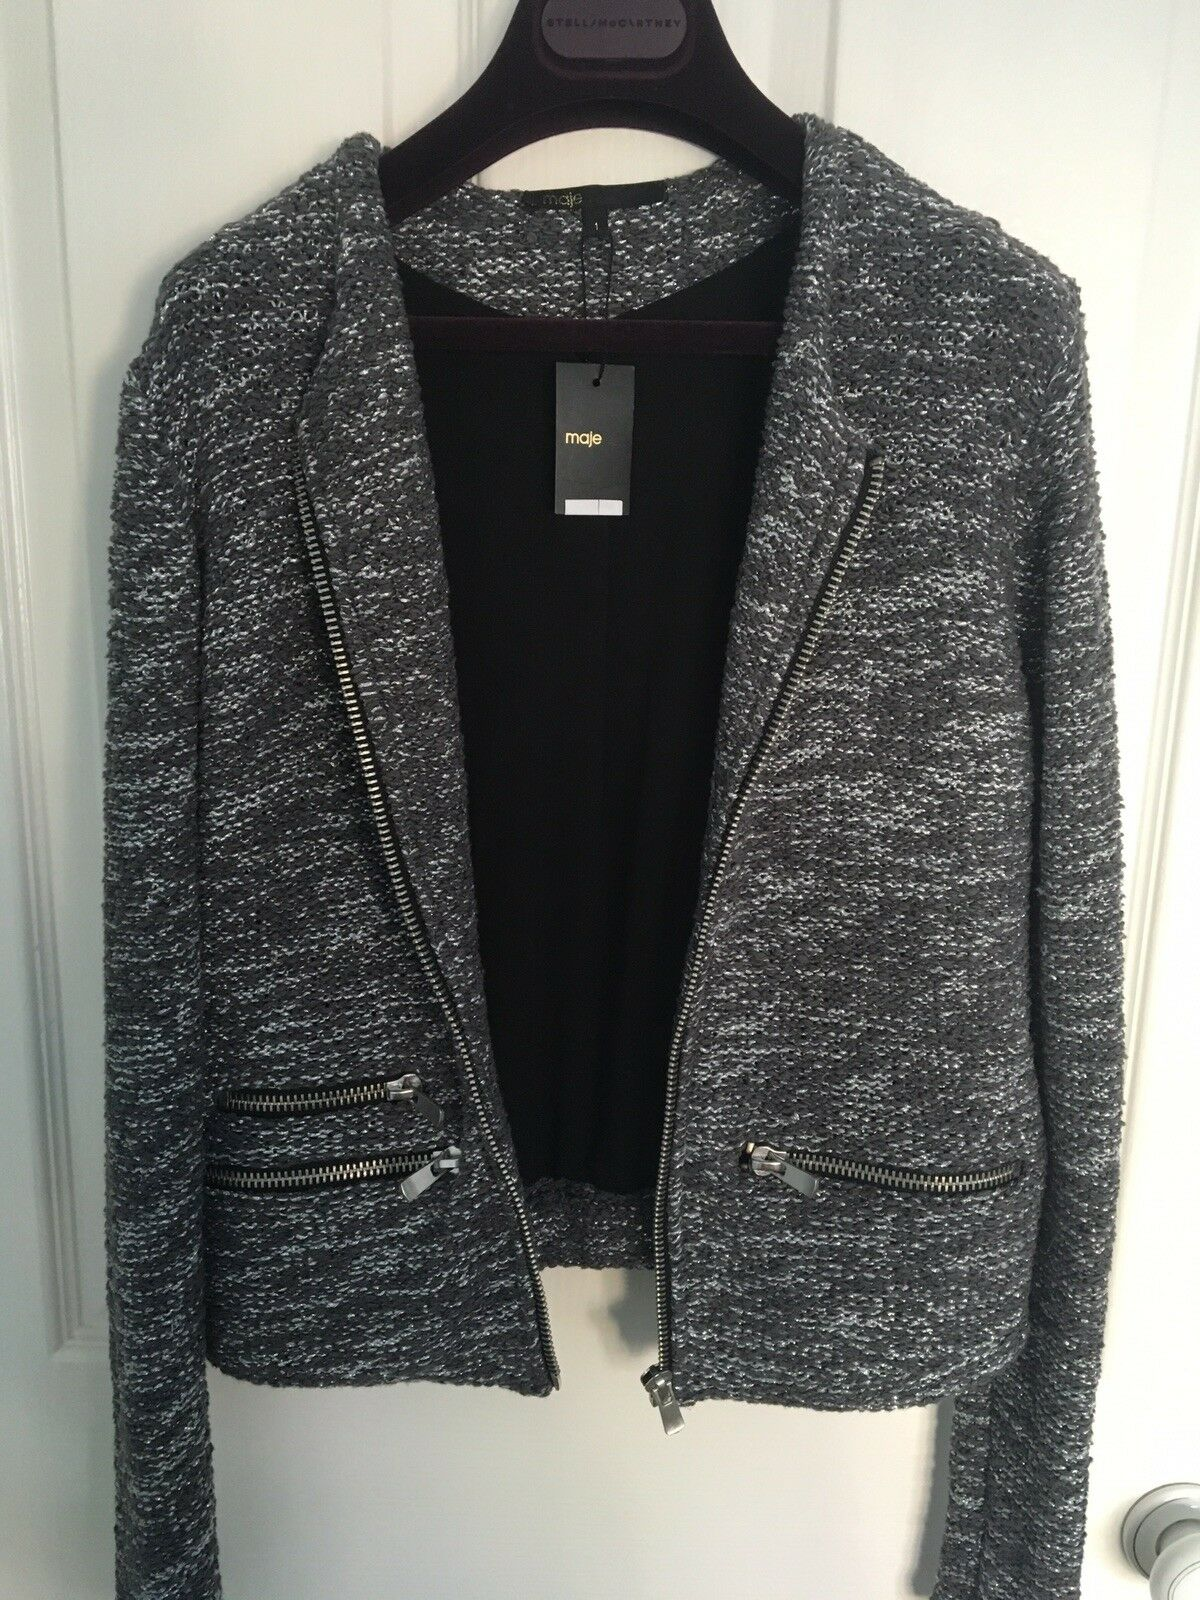 Brand New Maje Cardigan size 1